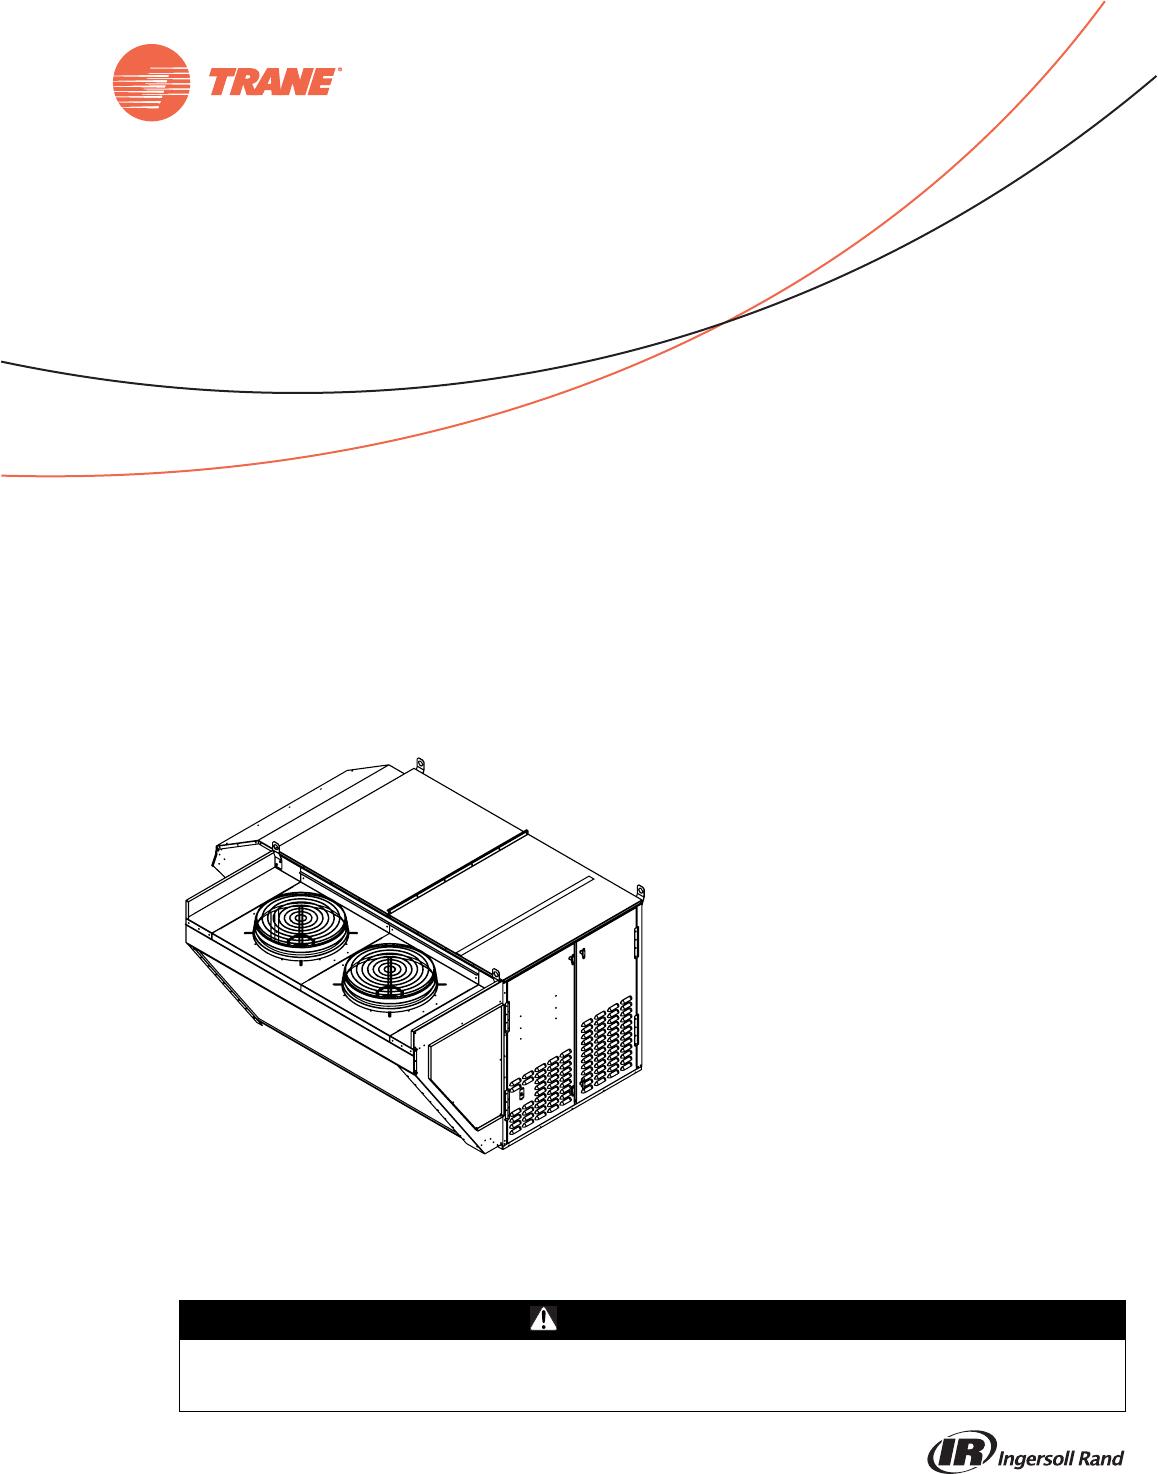 Trane Oa1D Oa2D Oa3D Indirect Gas Fired Electric Heat